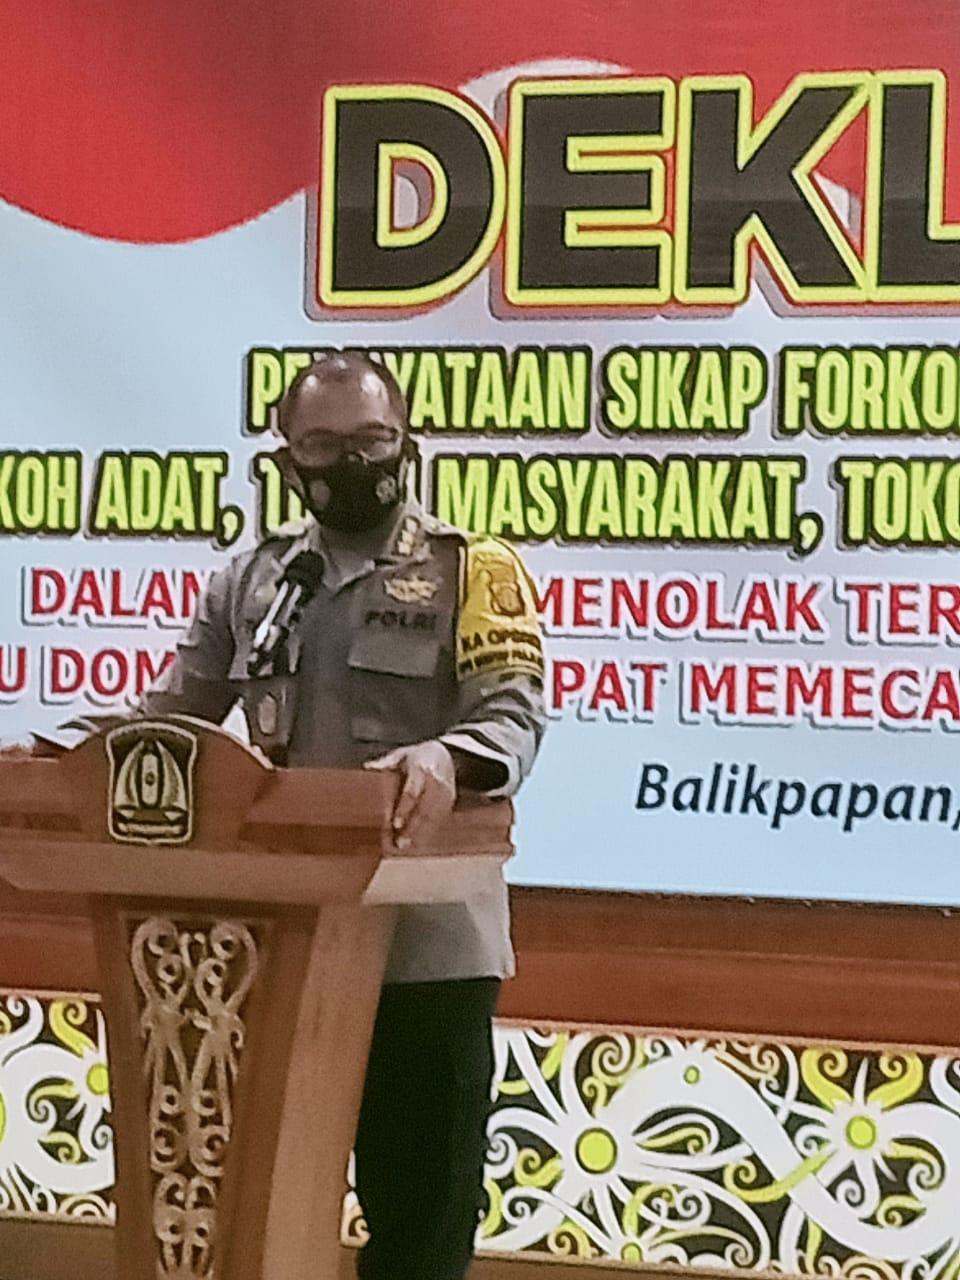 Kapolresta Balikpapan Kombes Pol Turmudi saat memberikan sambutan dalam deklarasi dan pernyataan sikap bersama menolak provokasi, Selasa (24/11). Foto: Istimimewa